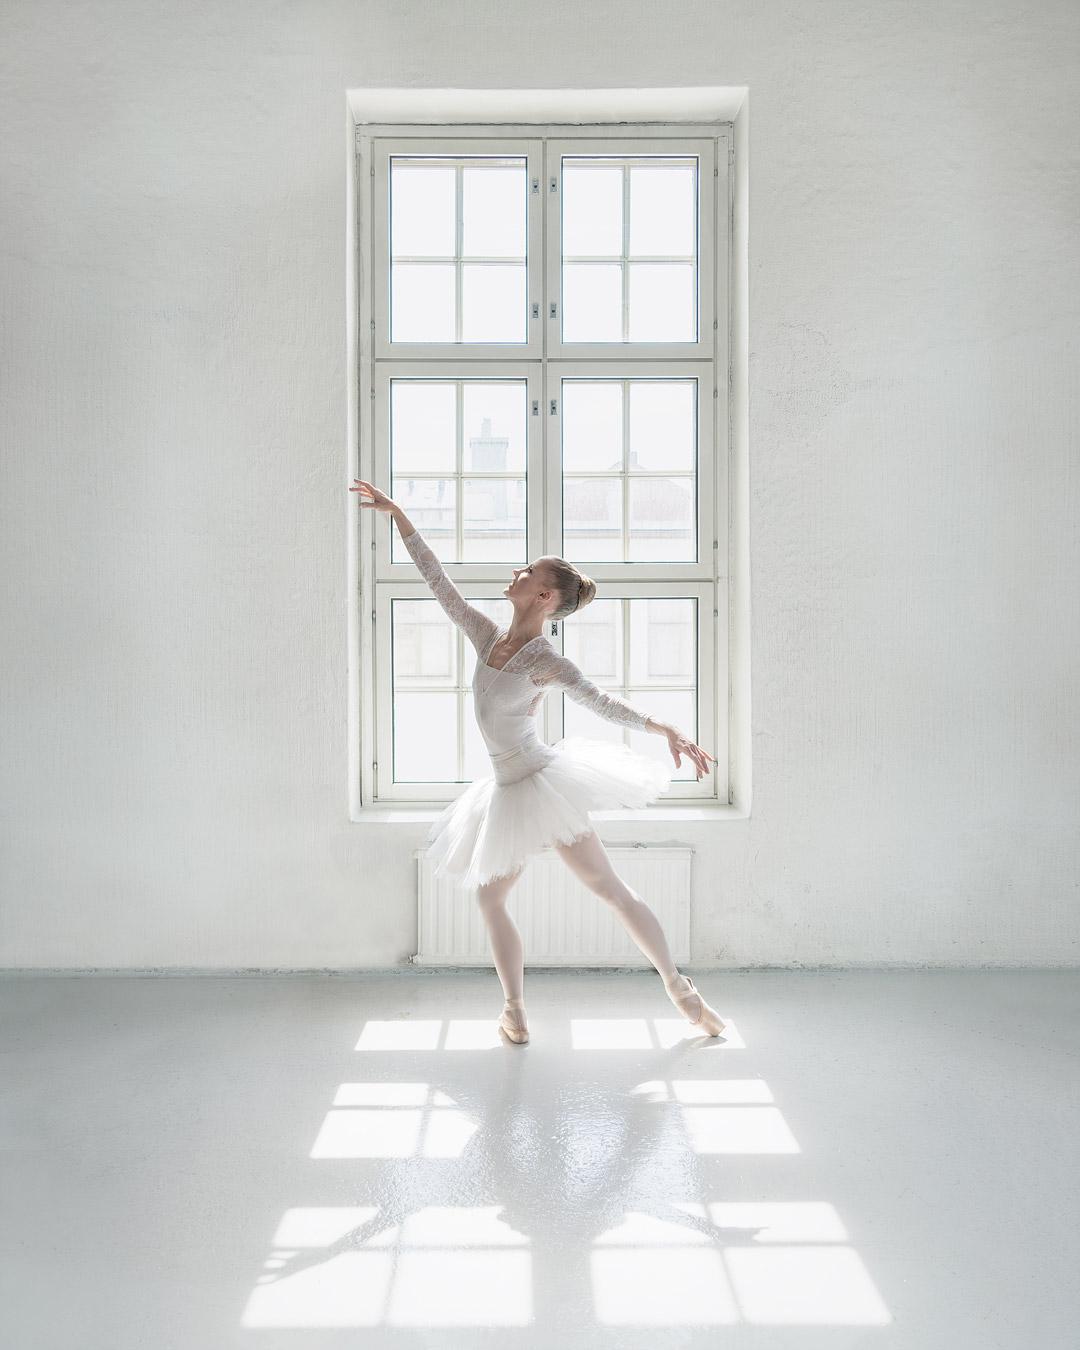 Ballerina and window